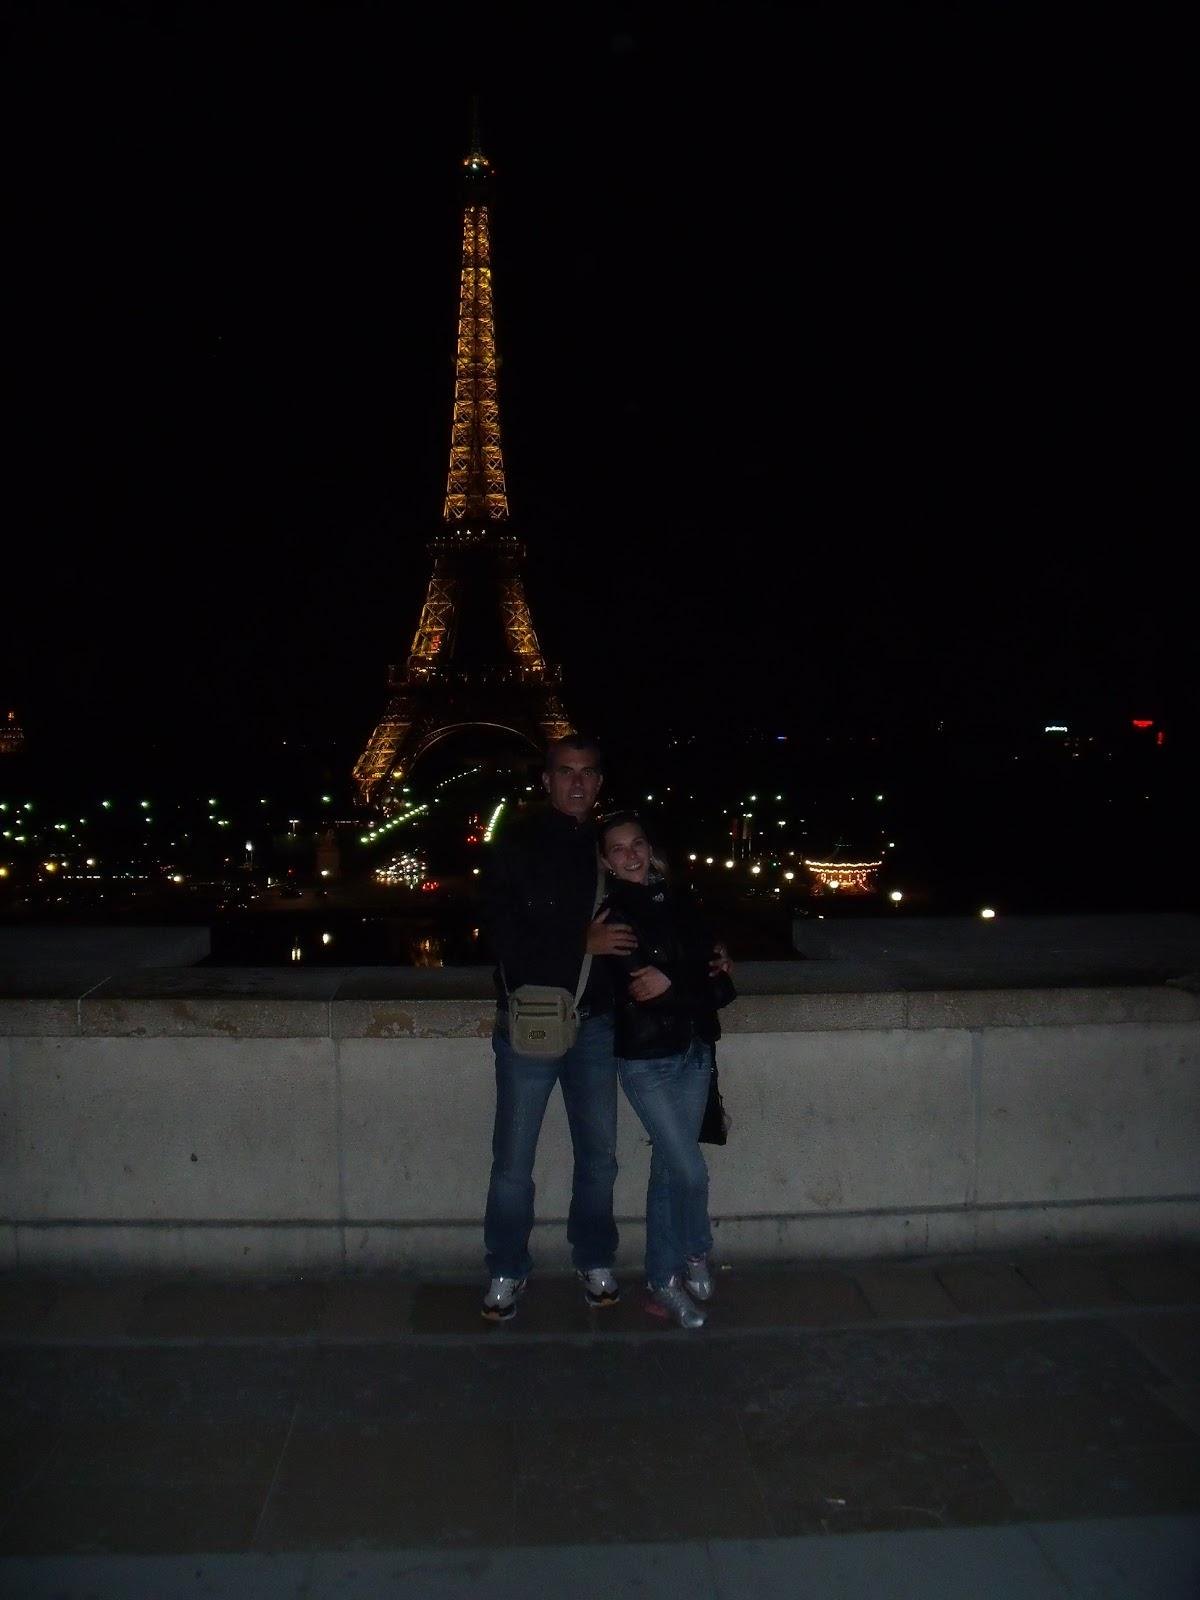 http://2.bp.blogspot.com/-FKkMwKuQr1k/ThtoVe2v86I/AAAAAAAAANg/31yd74zelTQ/s1600/Europa+734+Tour+Eiffel.jpg